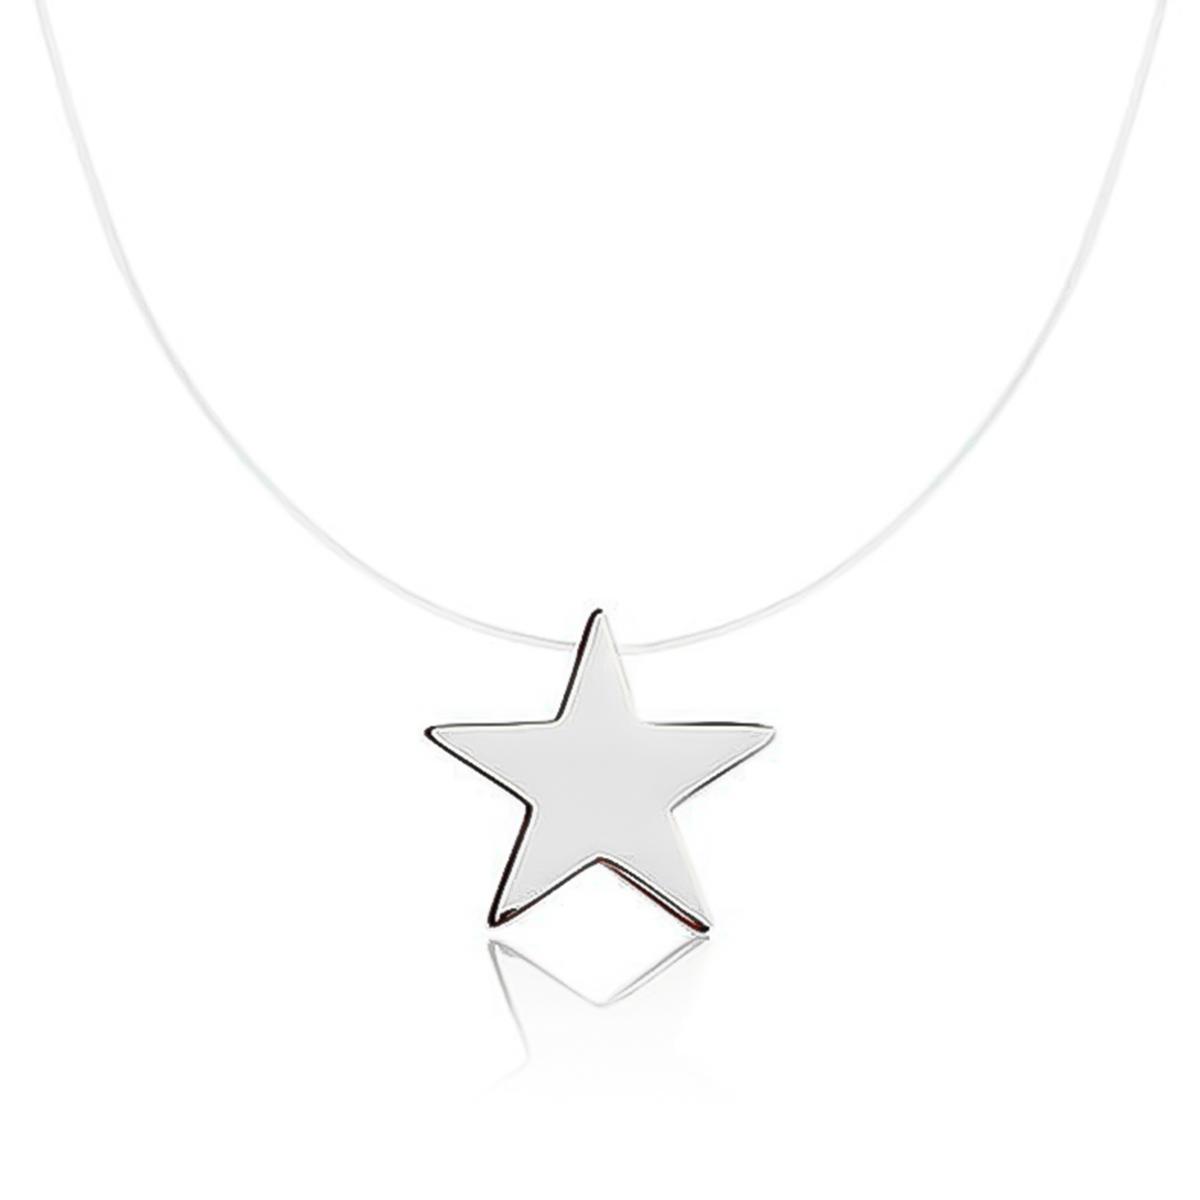 Colar De Estrela De Nylon Folheado Em Ródio Branco